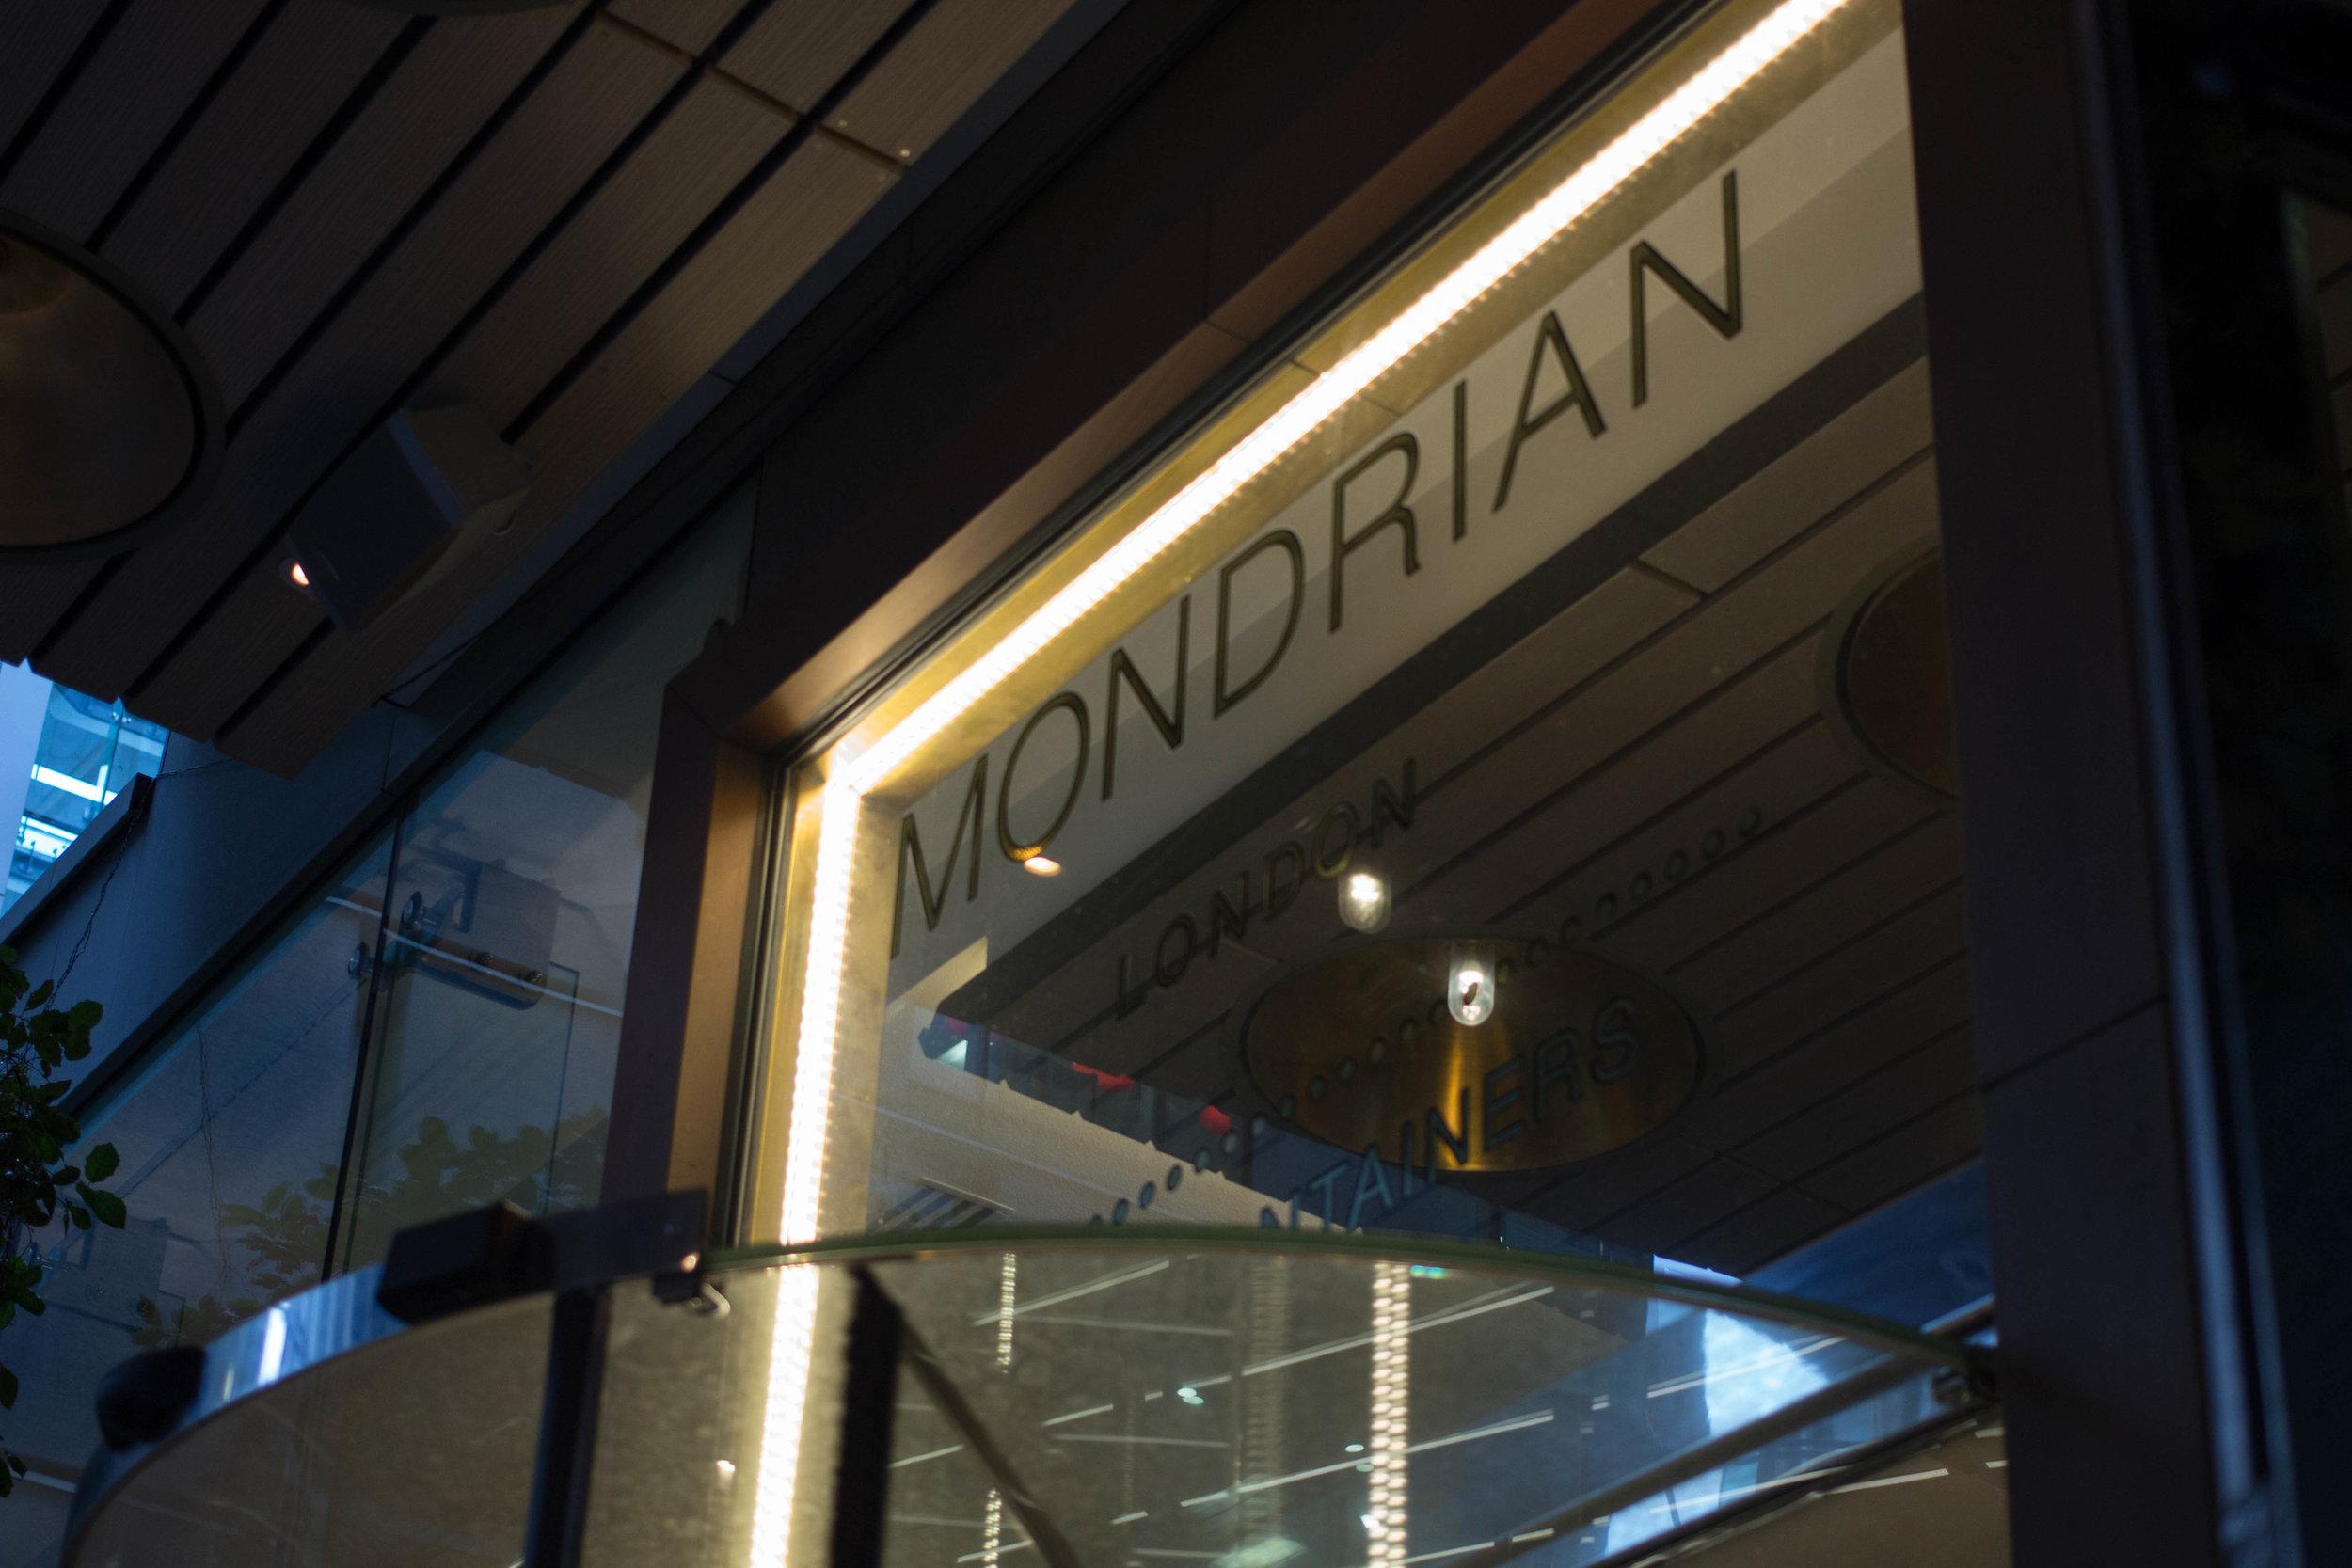 Mondrian-London-FMIF-114.jpg